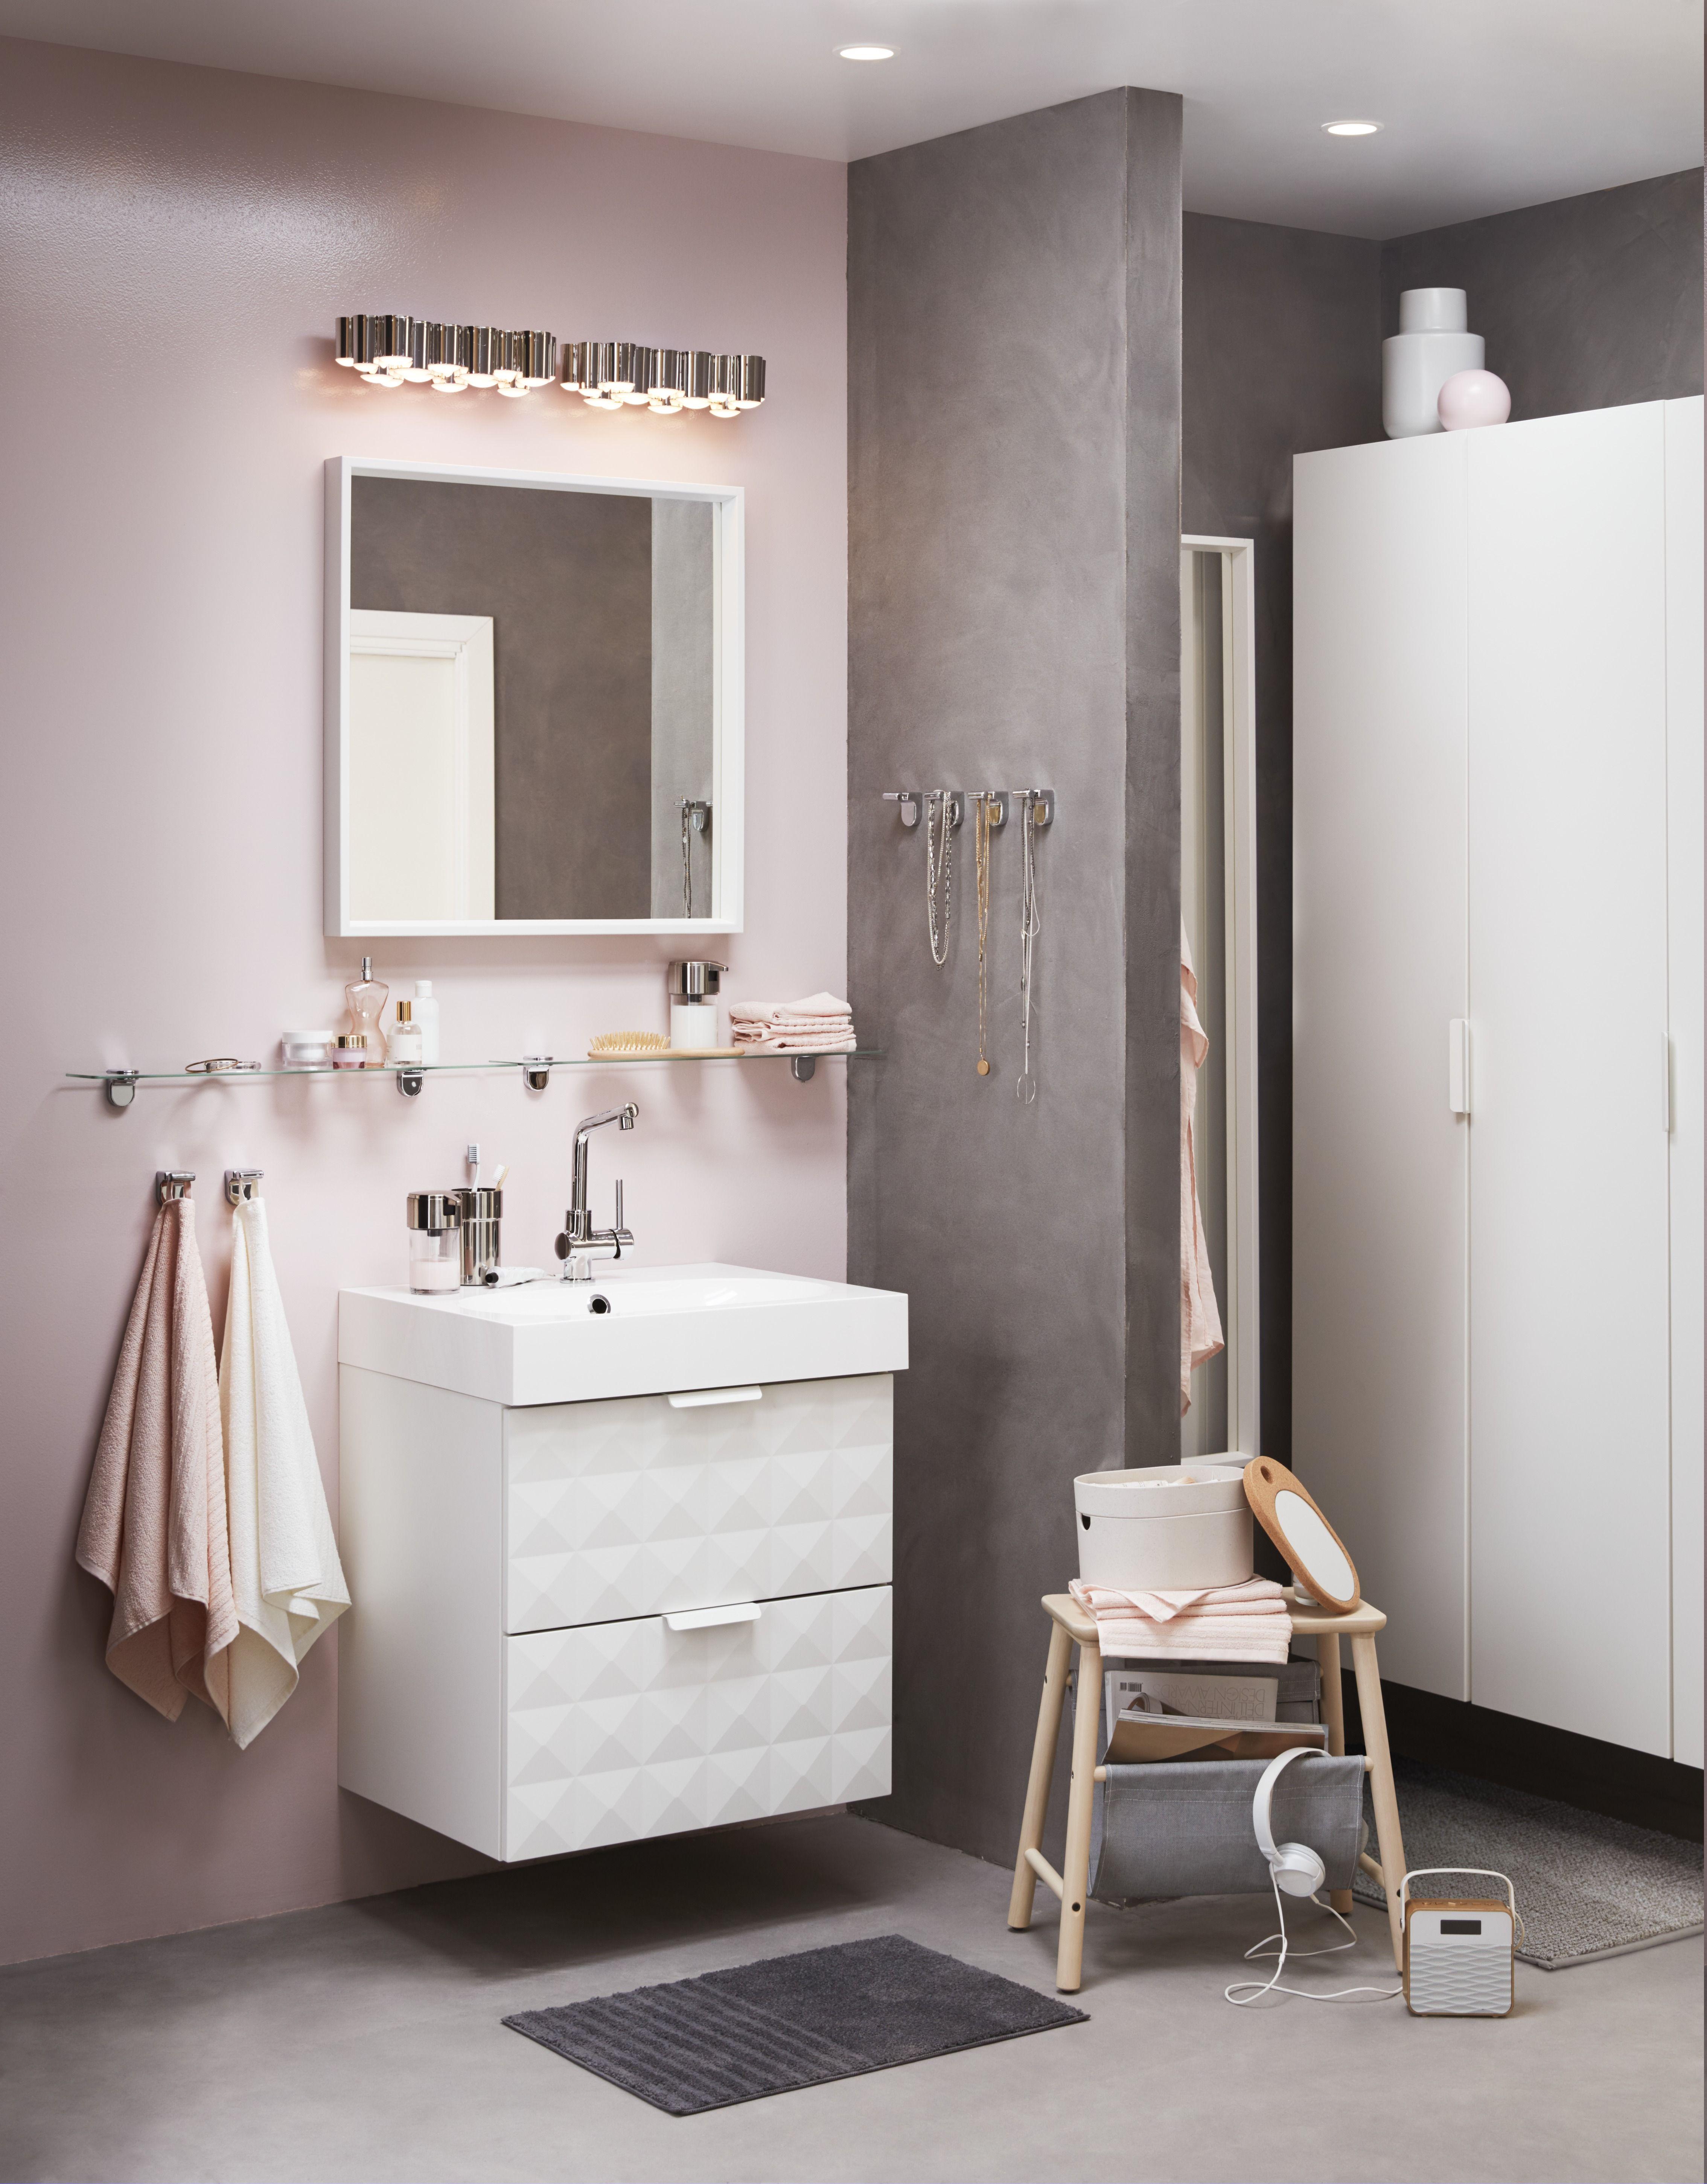 Ikea Switzerland Furnishings For Your Home Ikea Ikea Bathroom Bathroom Decor